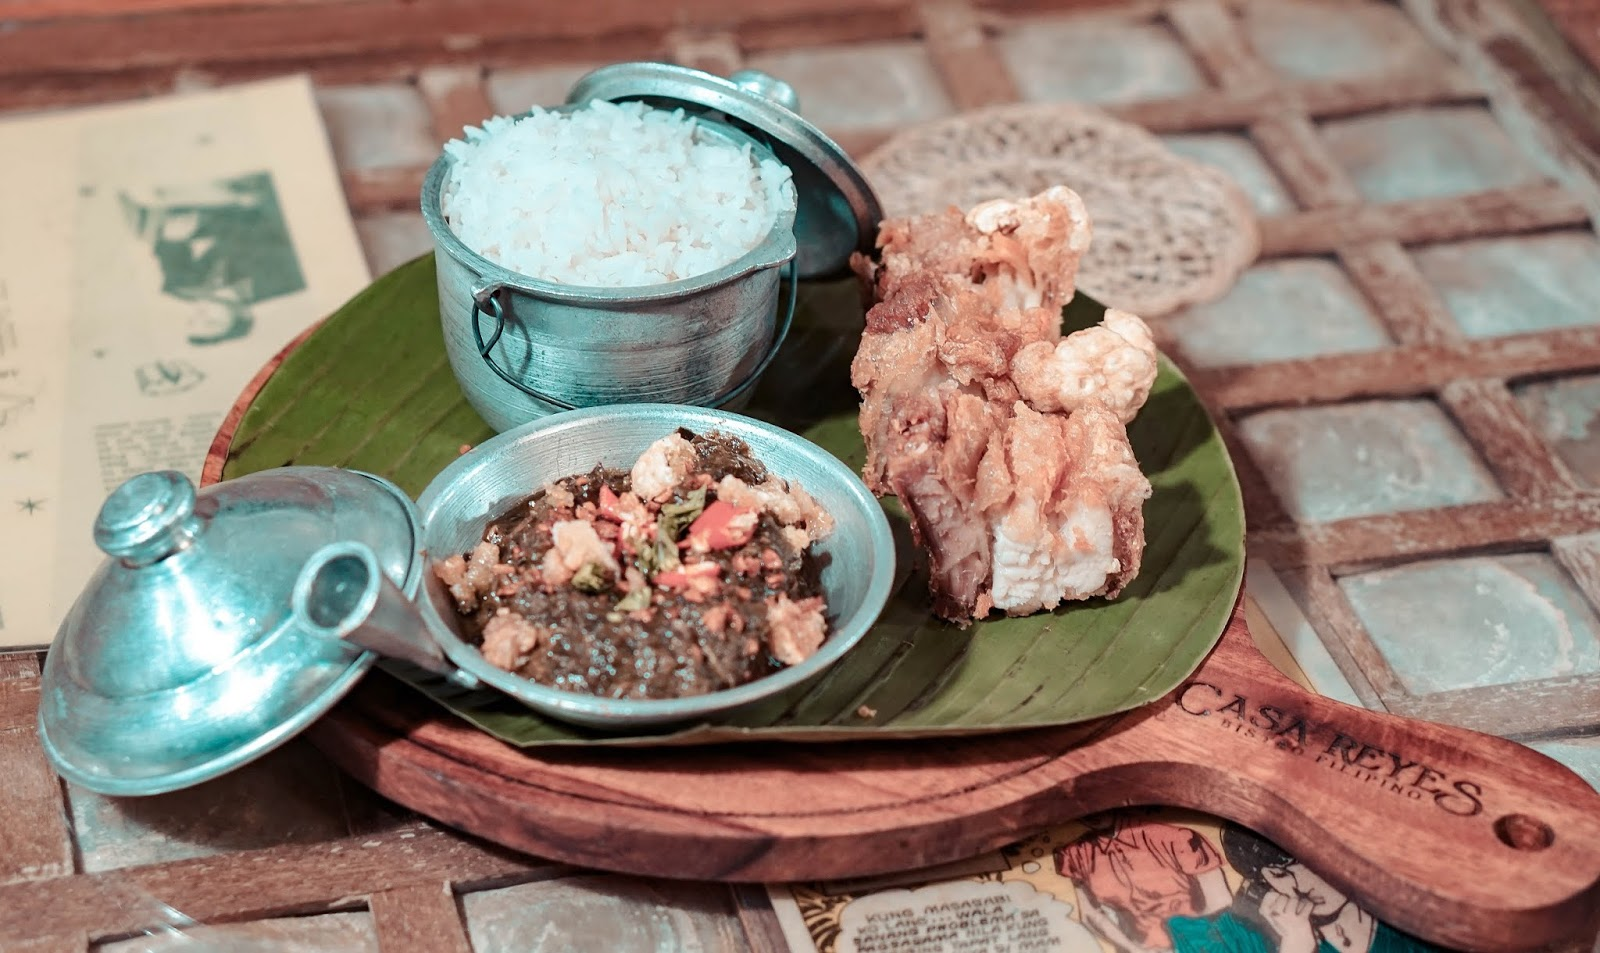 Where to eat in Greenhills - Casa Reyes Bistro Filipino, best wagyu beef